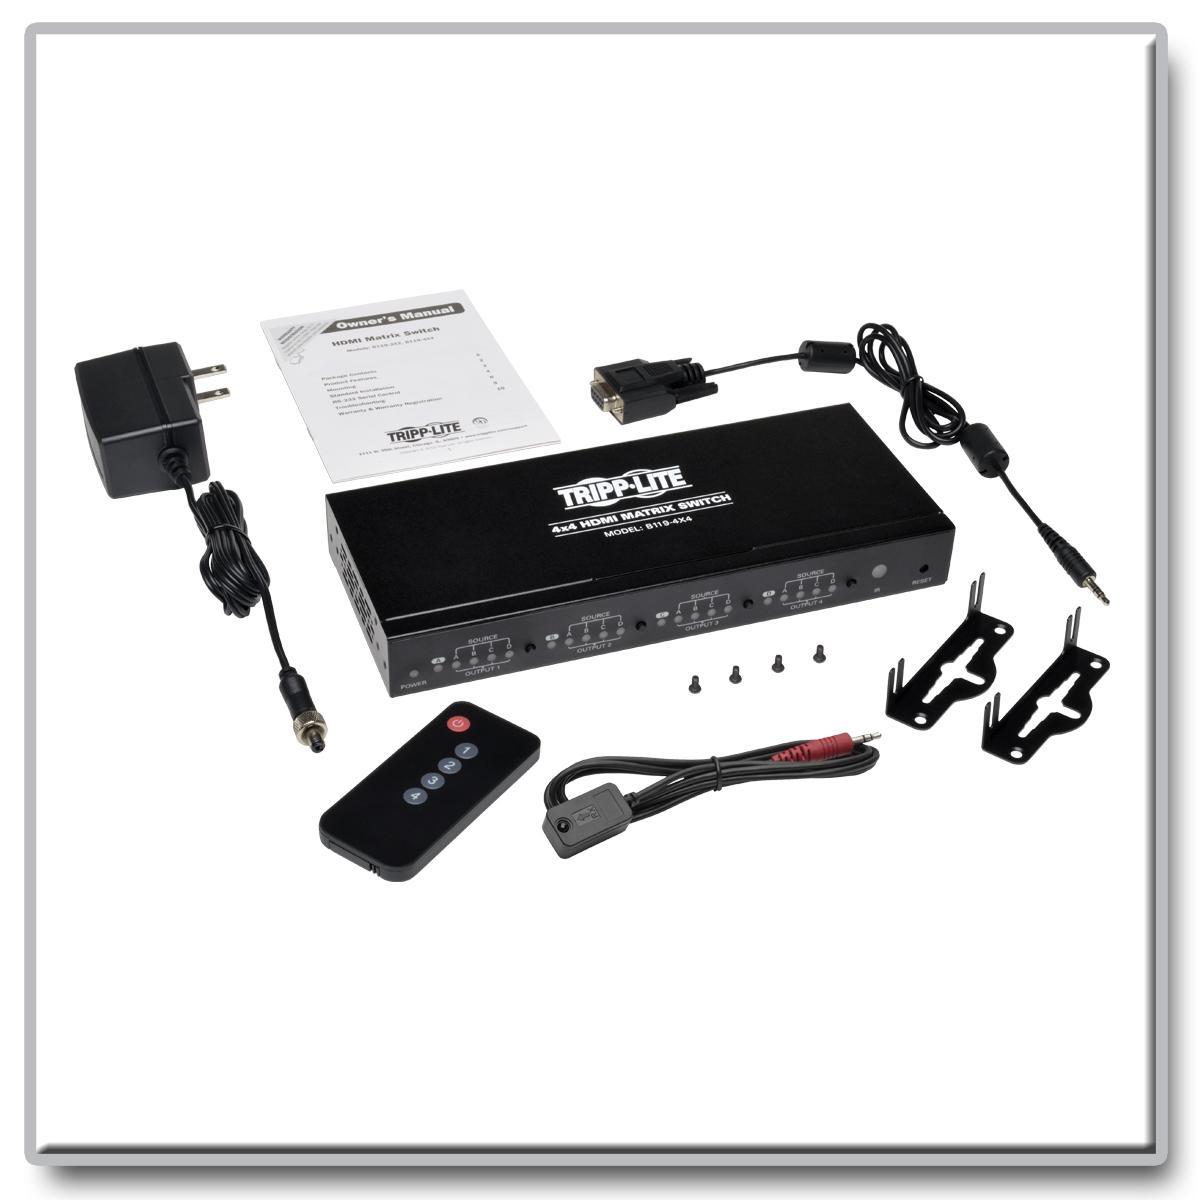 Tripp Lite 4x4 Hdmi Matrix Switch For Video And Audio Details About Cat5e Cat6 Auto Splitter Extender View Larger